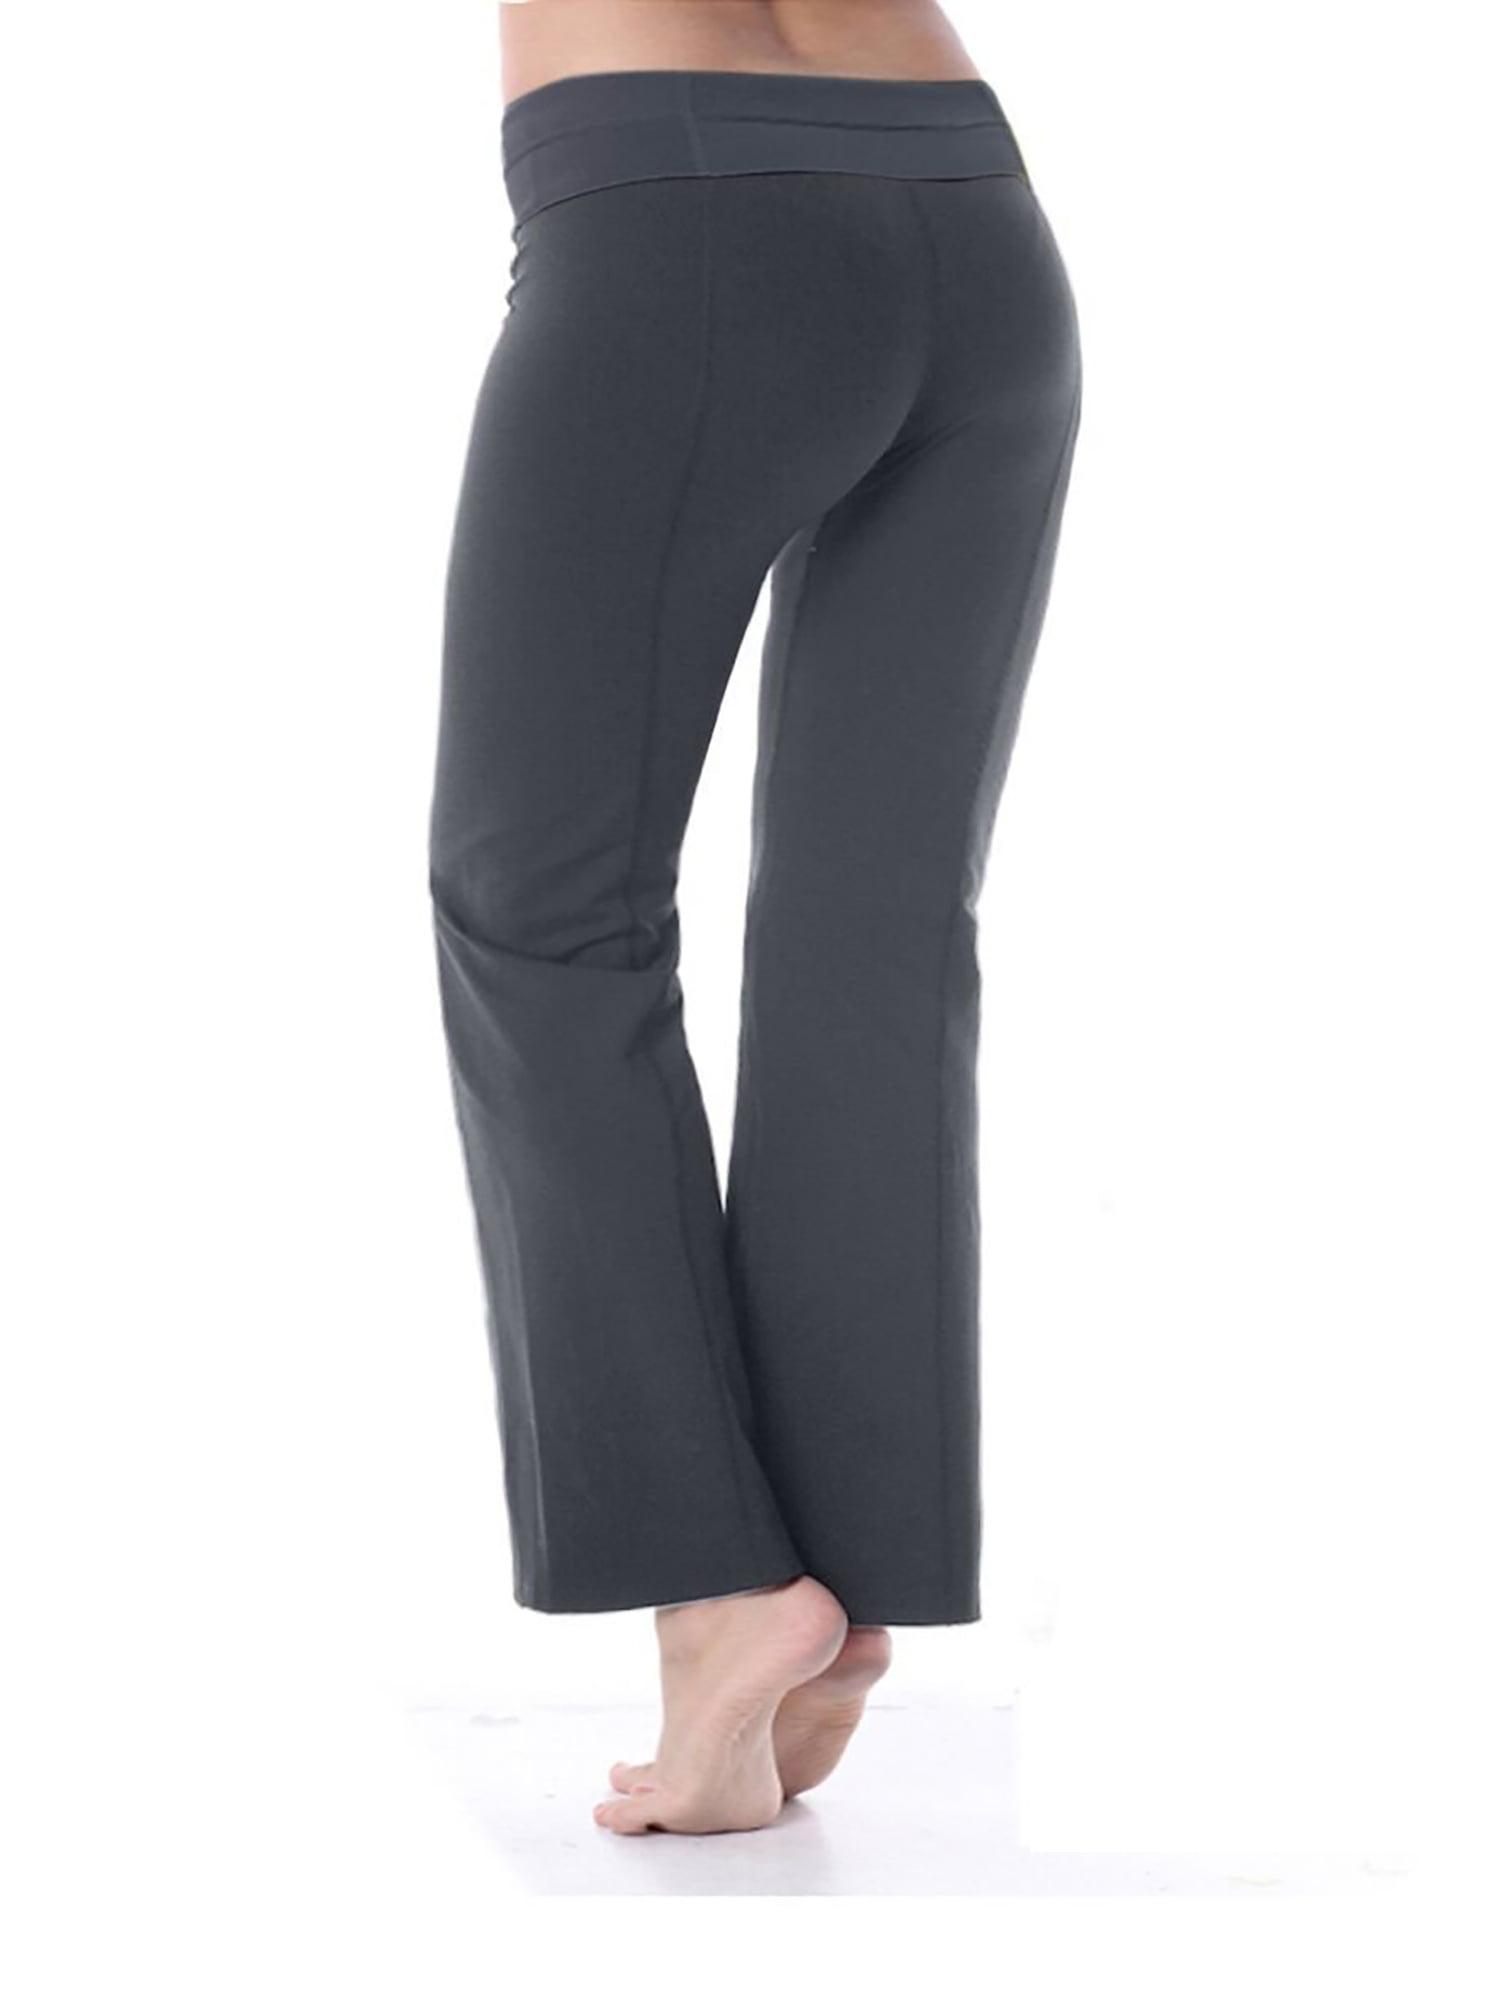 32db8da446b61 TruActivewear - Bootcut Yoga Pants Cotton with Contrast Waistband -  Walmart.com